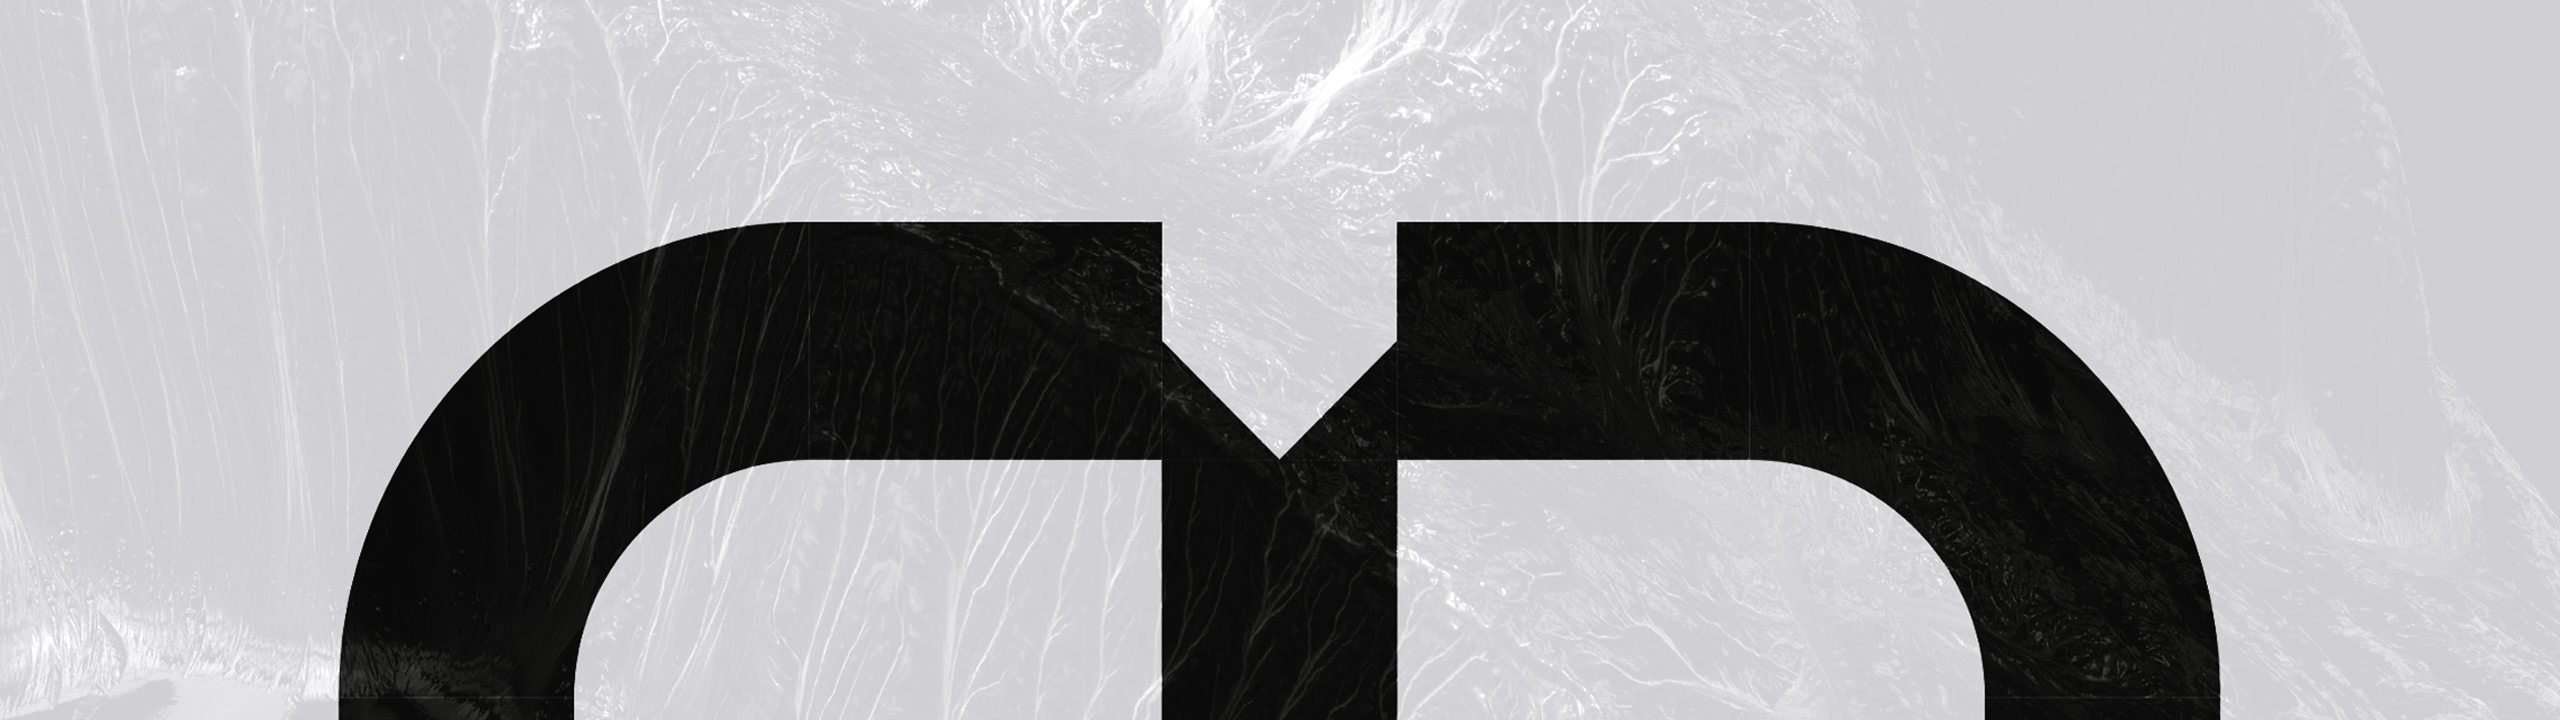 Logofolio 2016/2020